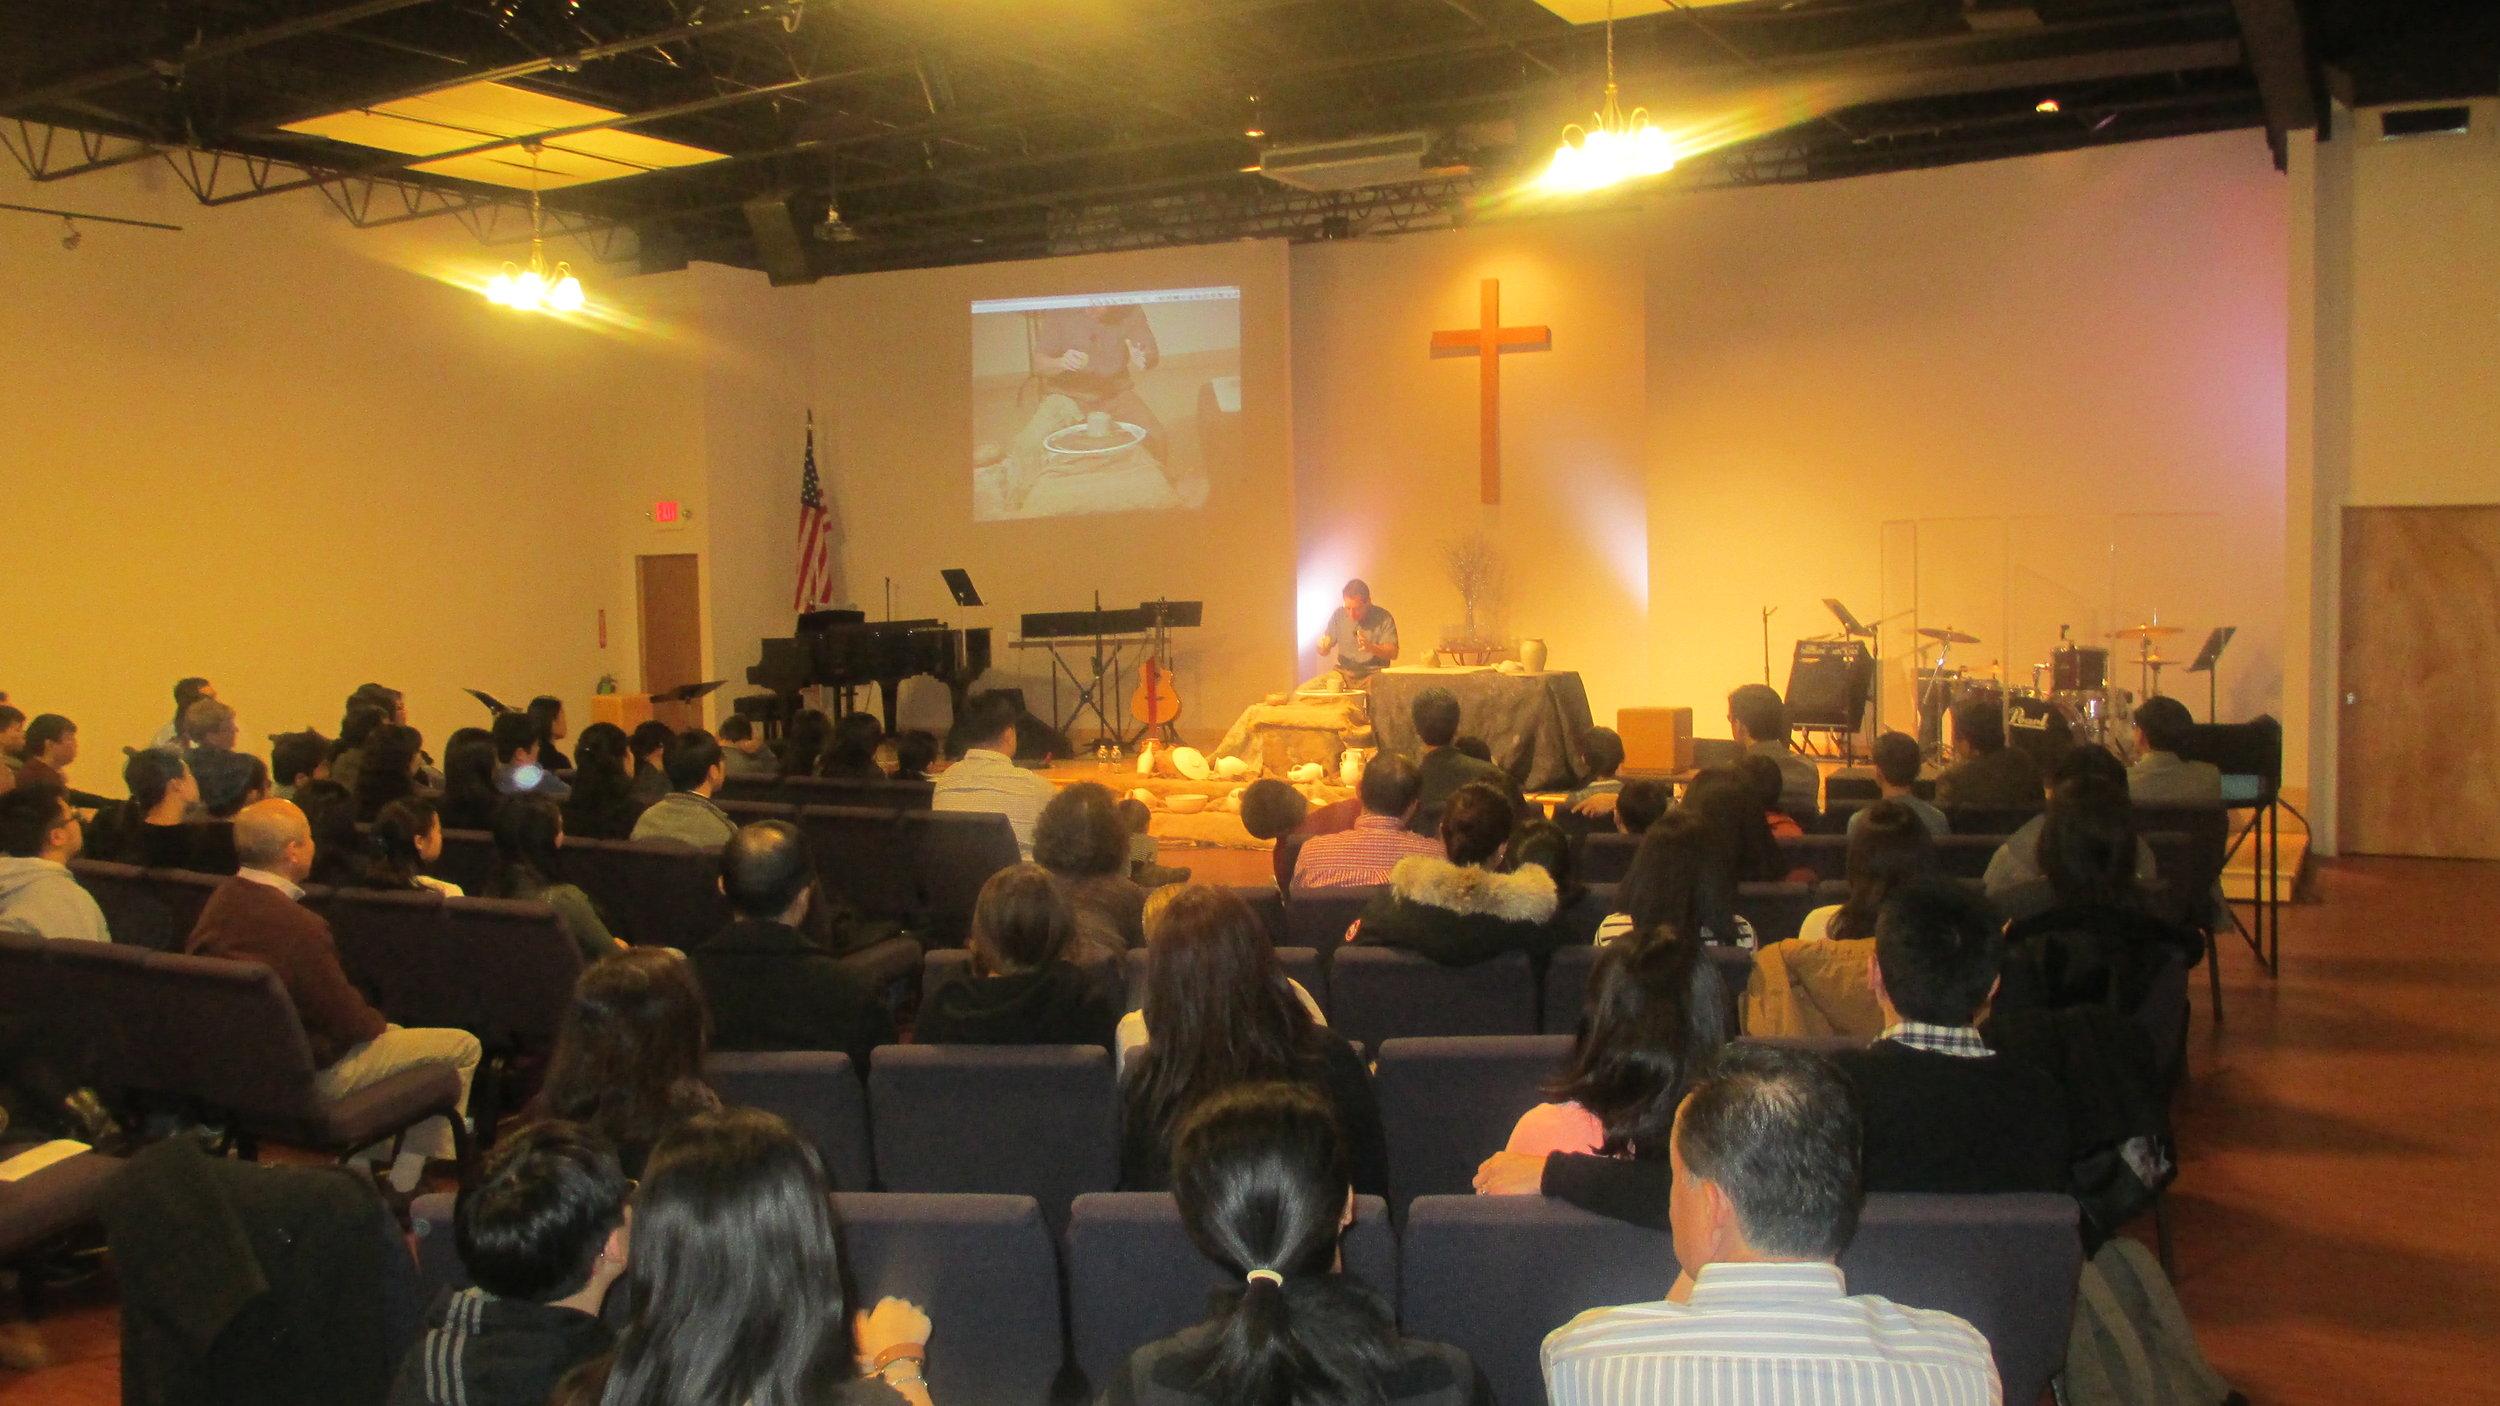 Riverside Community Church, Elmwood PK. NJ 012.JPG